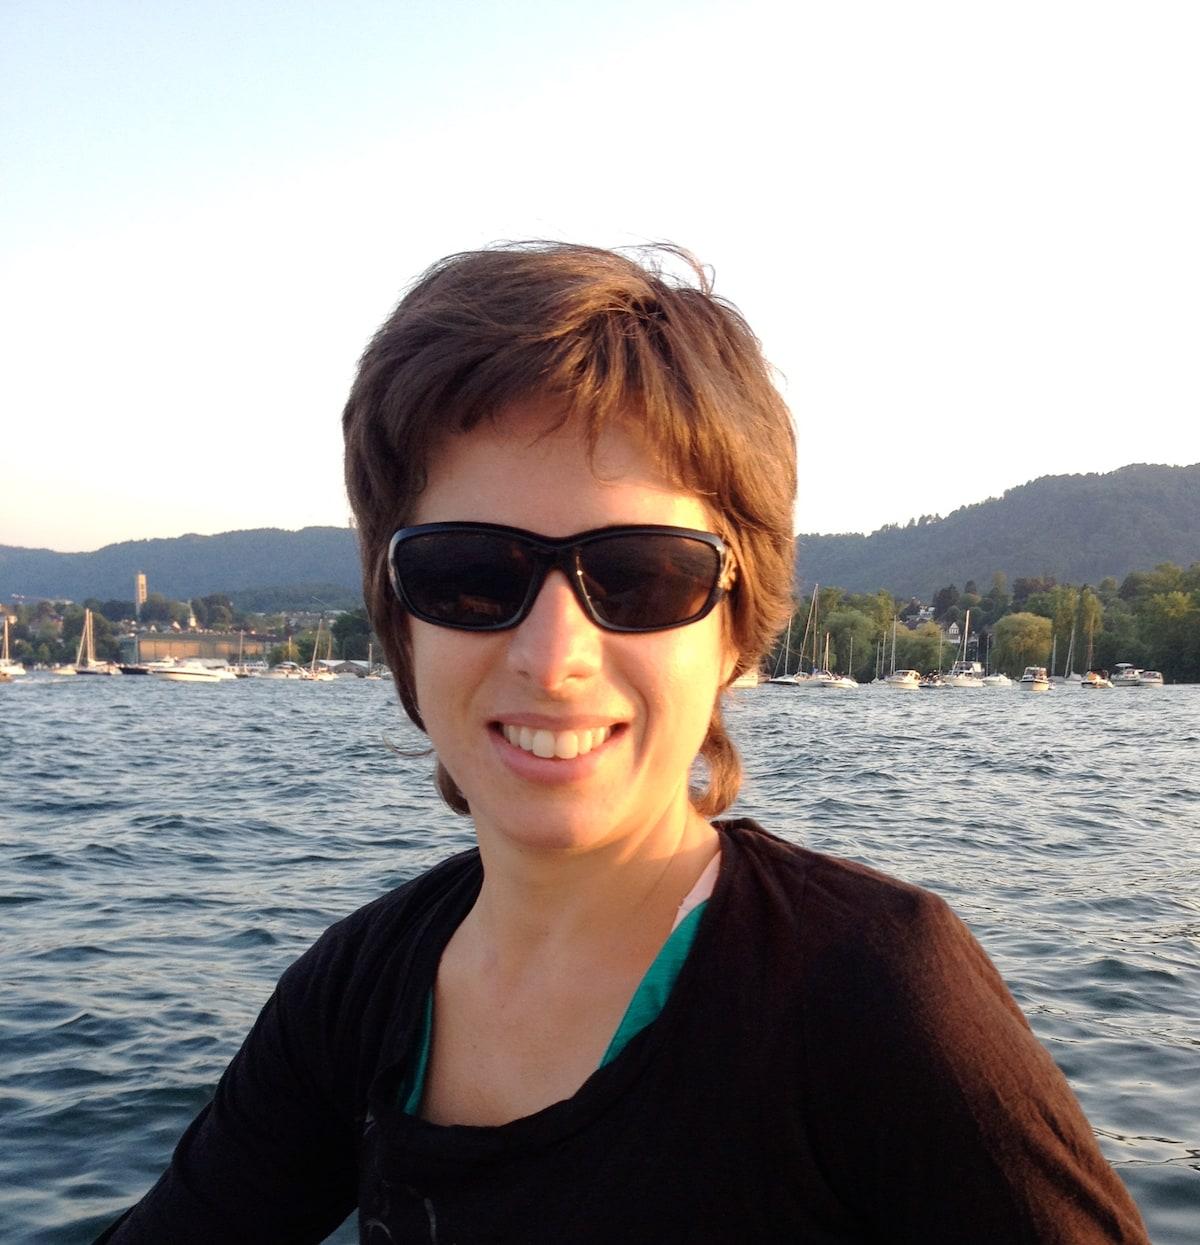 Sarah From Winterthur, Switzerland